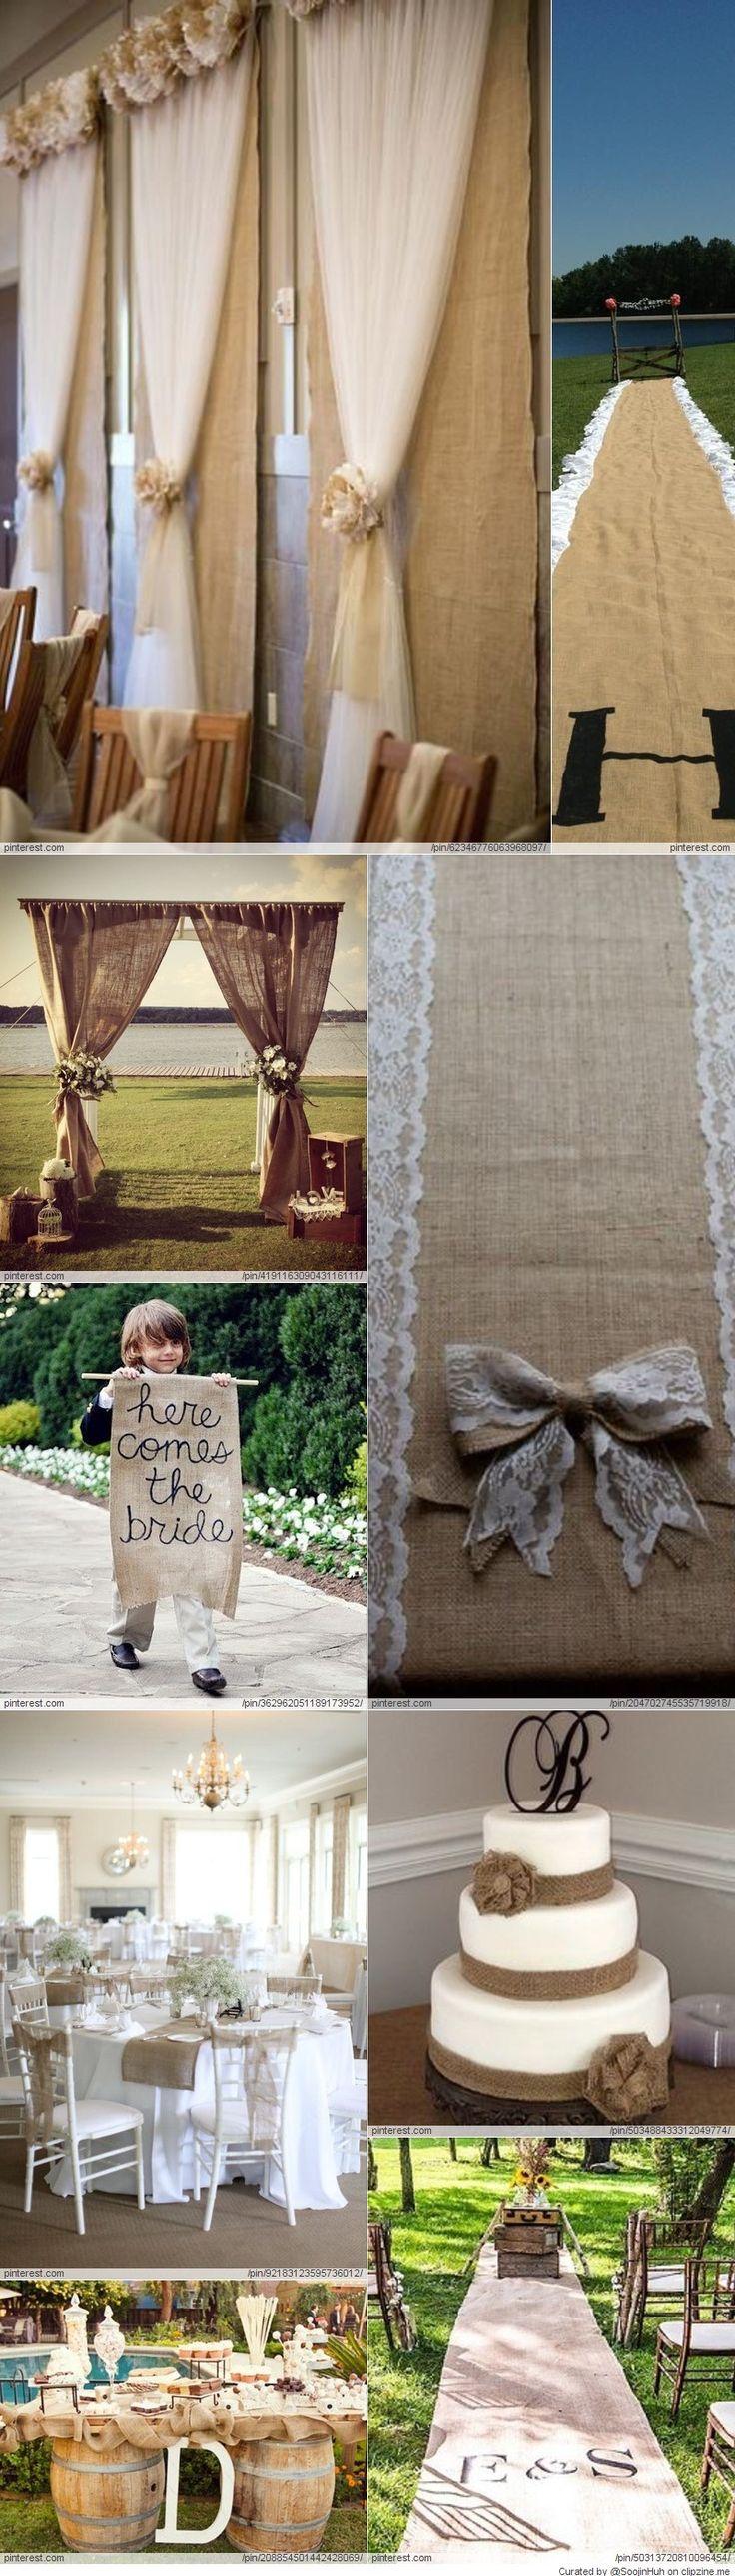 Burlap wedding ideas my kind of country wedding